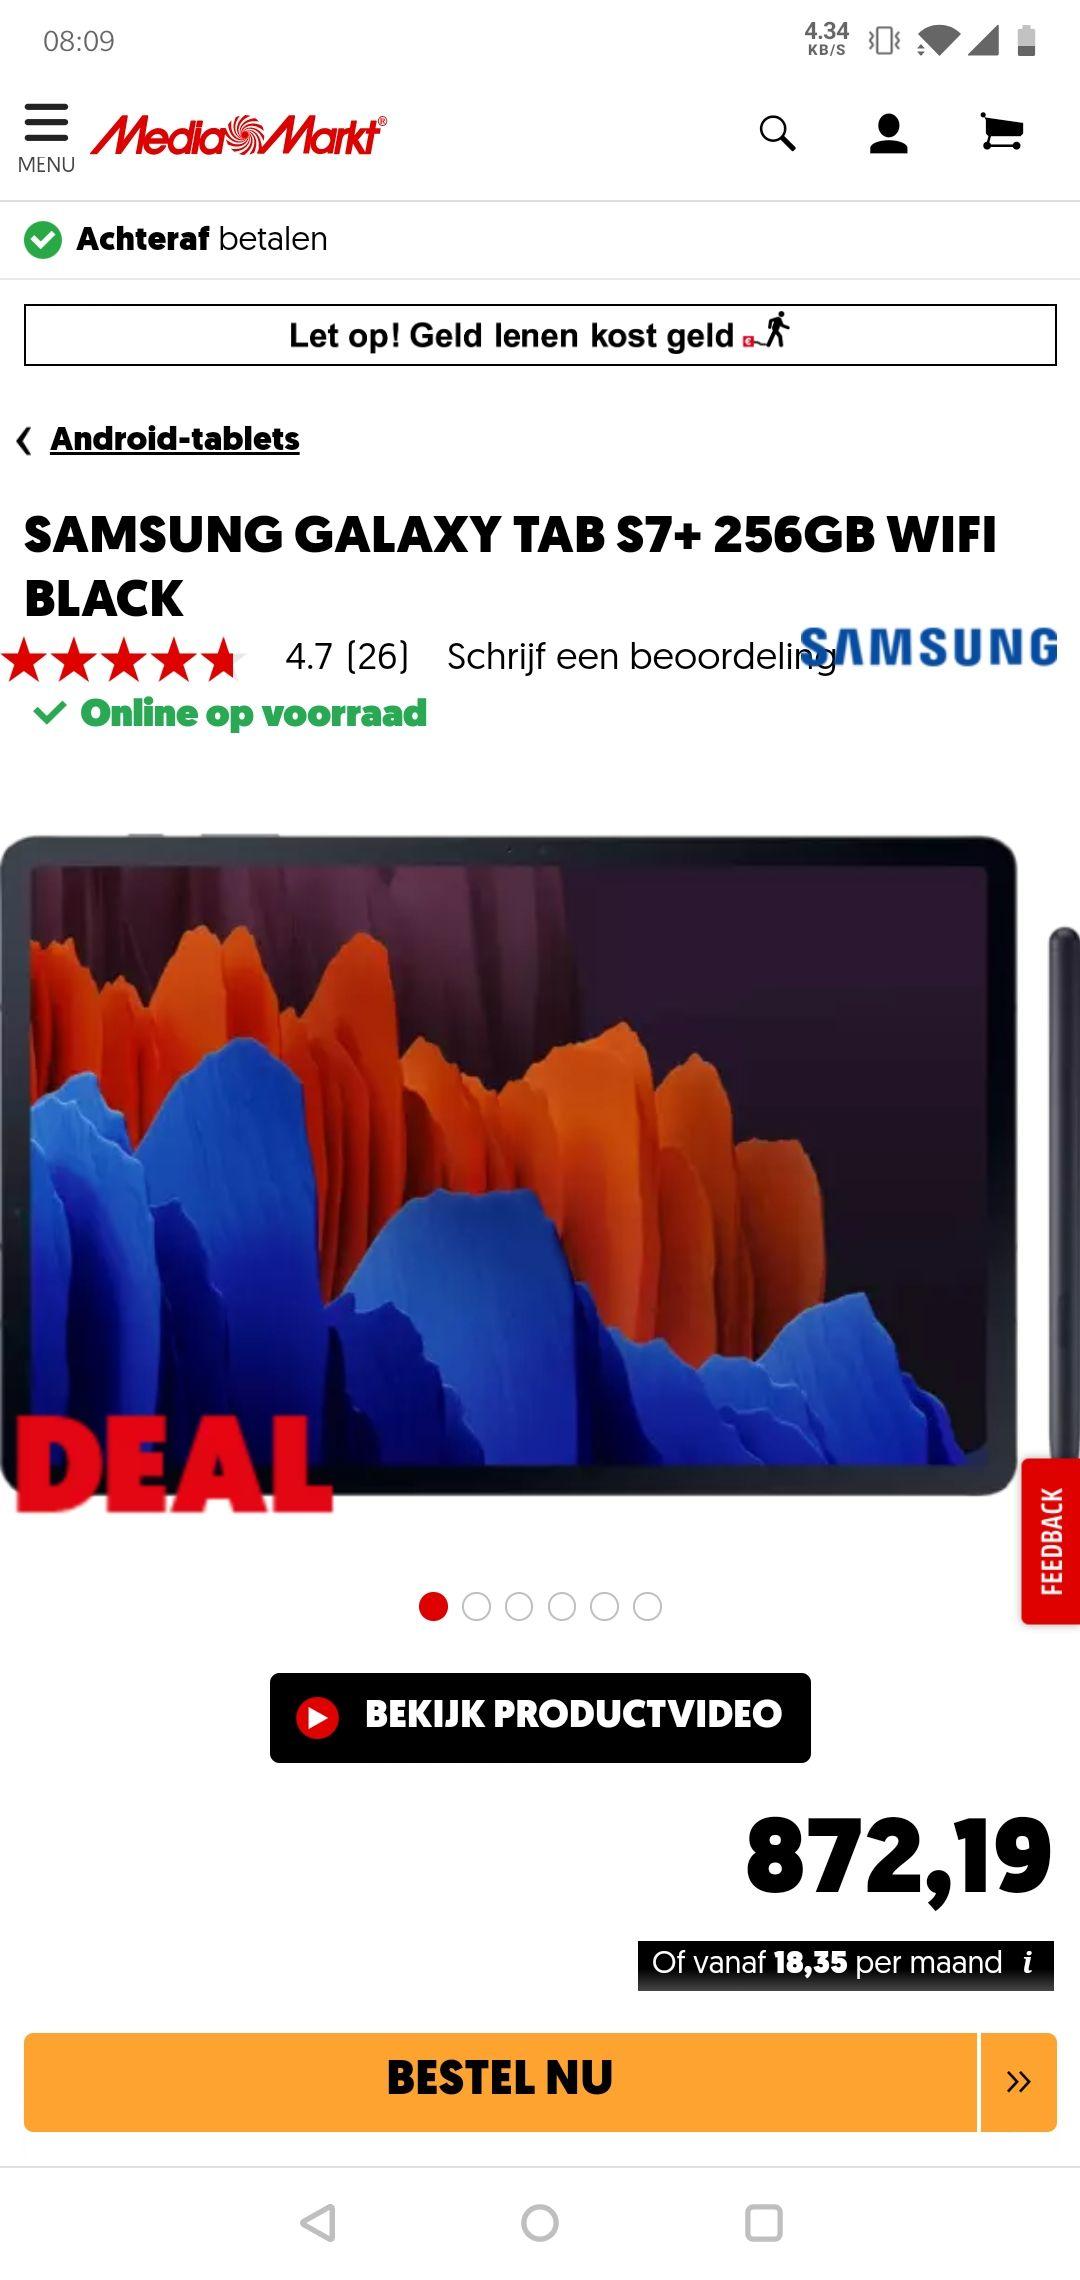 Samsung Galaxy Tab S7+ 256GB WiFi